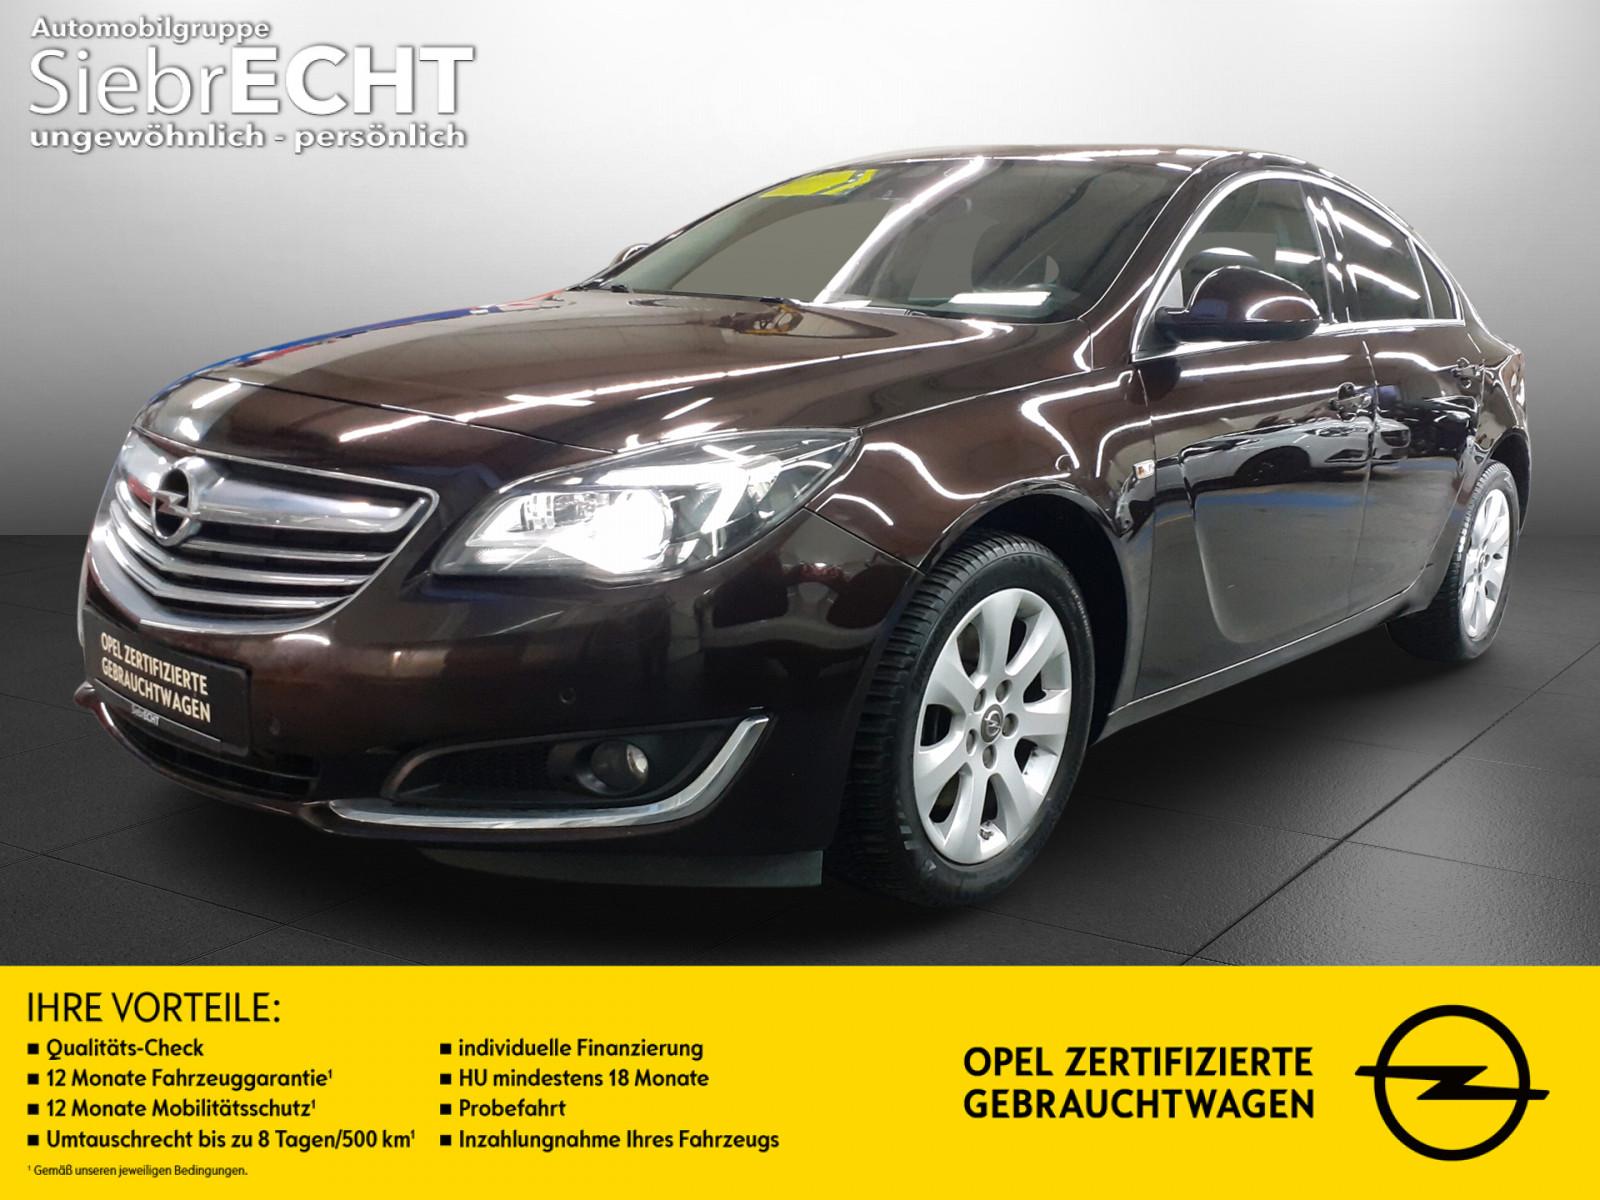 Opel Insignia A Innovation 1.6 SIDI Turbo*Navi*PDC, Jahr 2014, Benzin